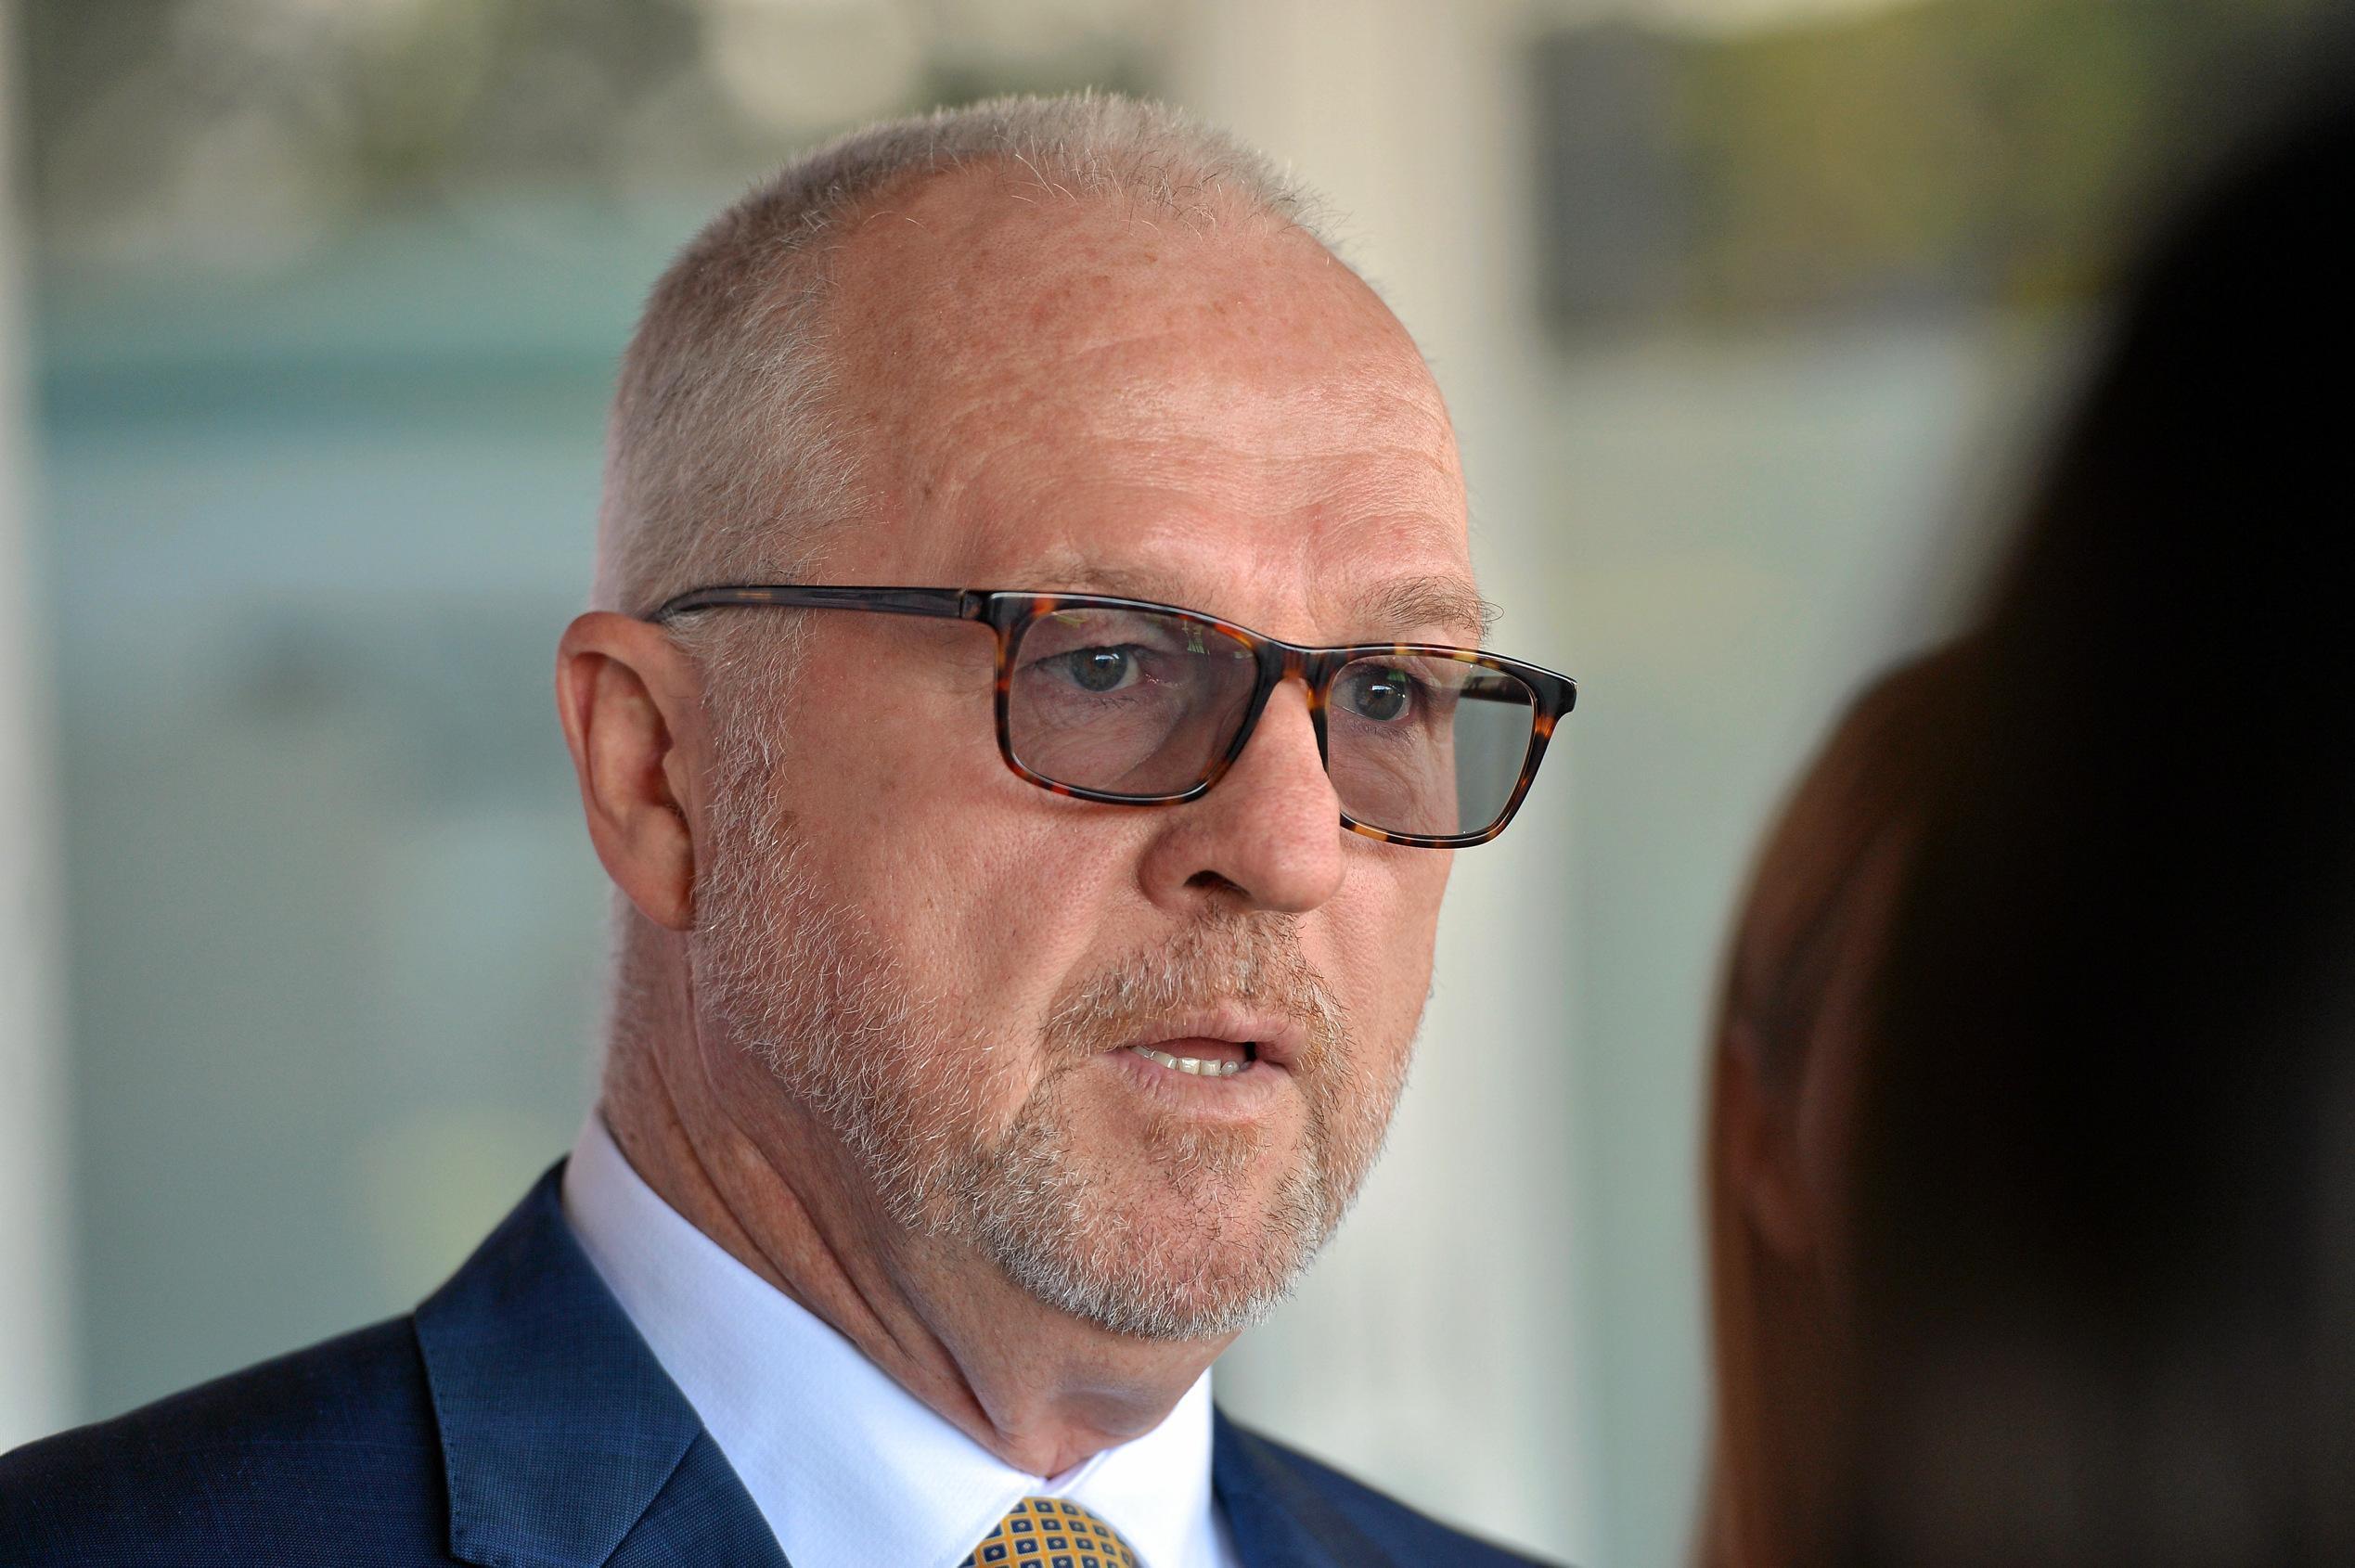 Sunshine Coast Mayor Mark Jamieson says a SEQ Olympics bid is all about the future liveability of the region.